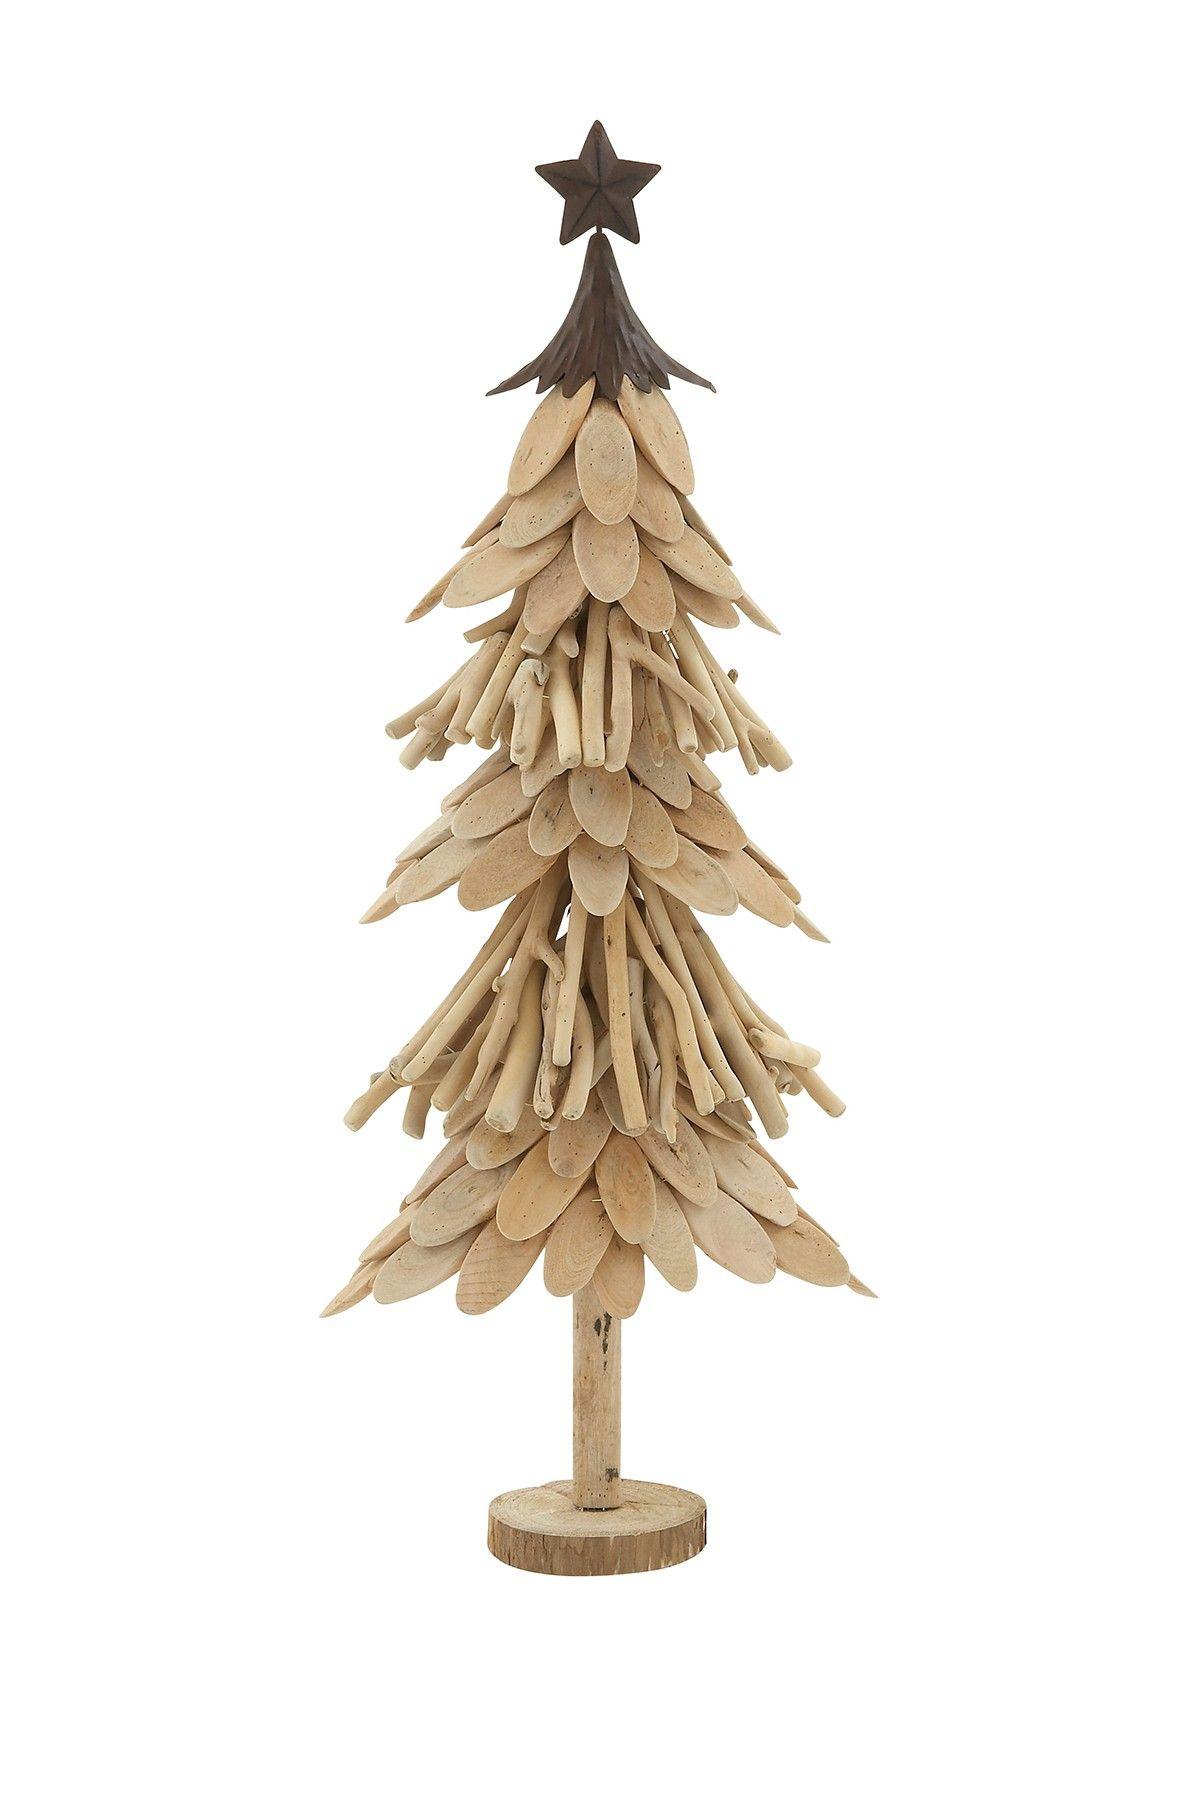 Wood & Metal Xmas Tree | Pinterest | Xmas tree, Xmas and Metals